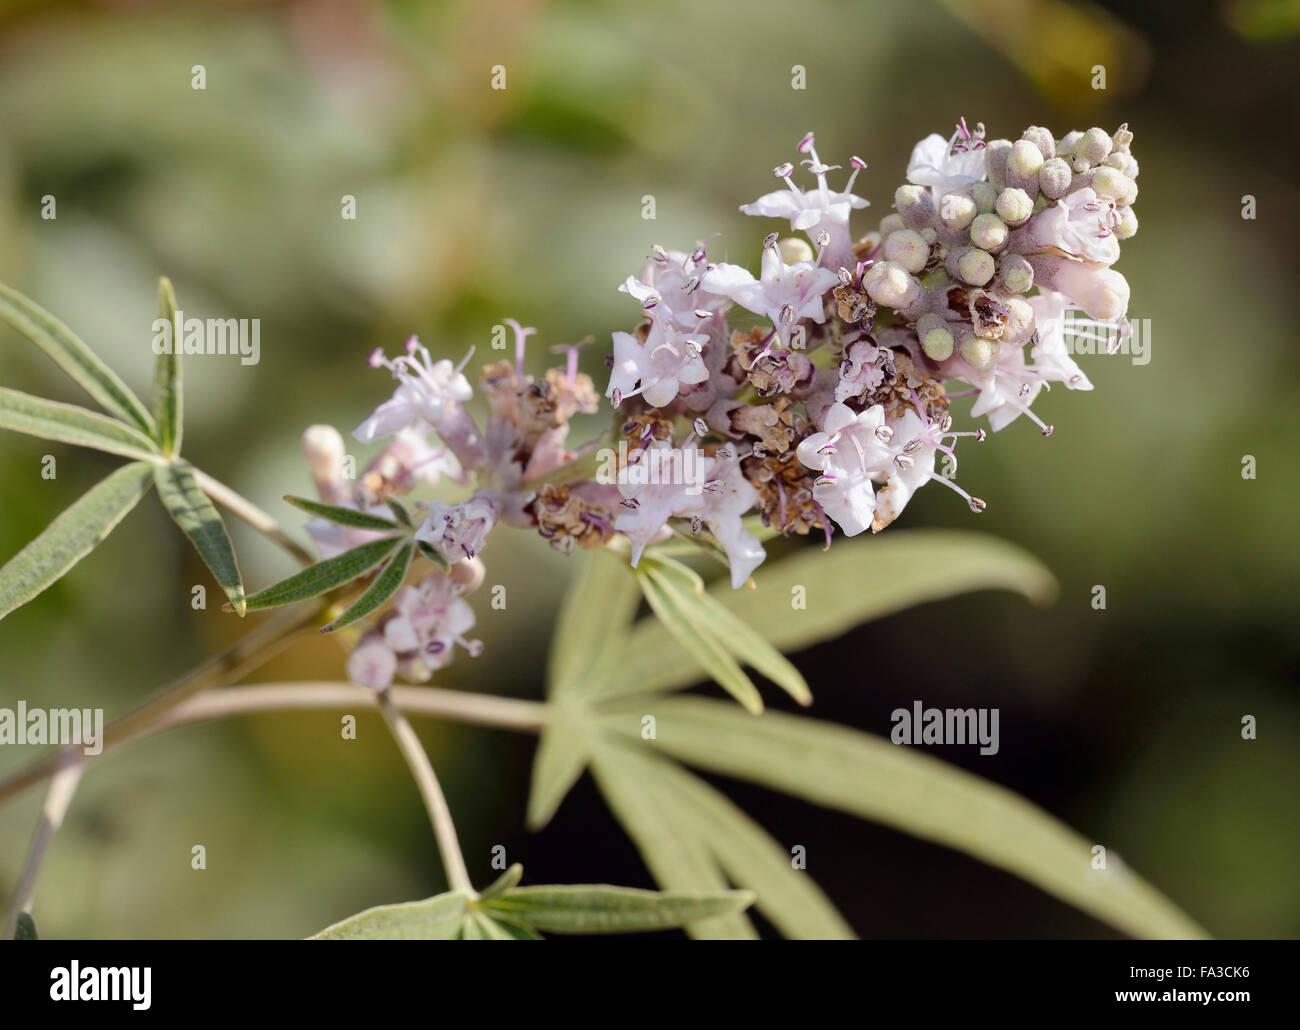 Chaste Tree - Vitex agnus-castus Used in alternative medicine Stock Photo